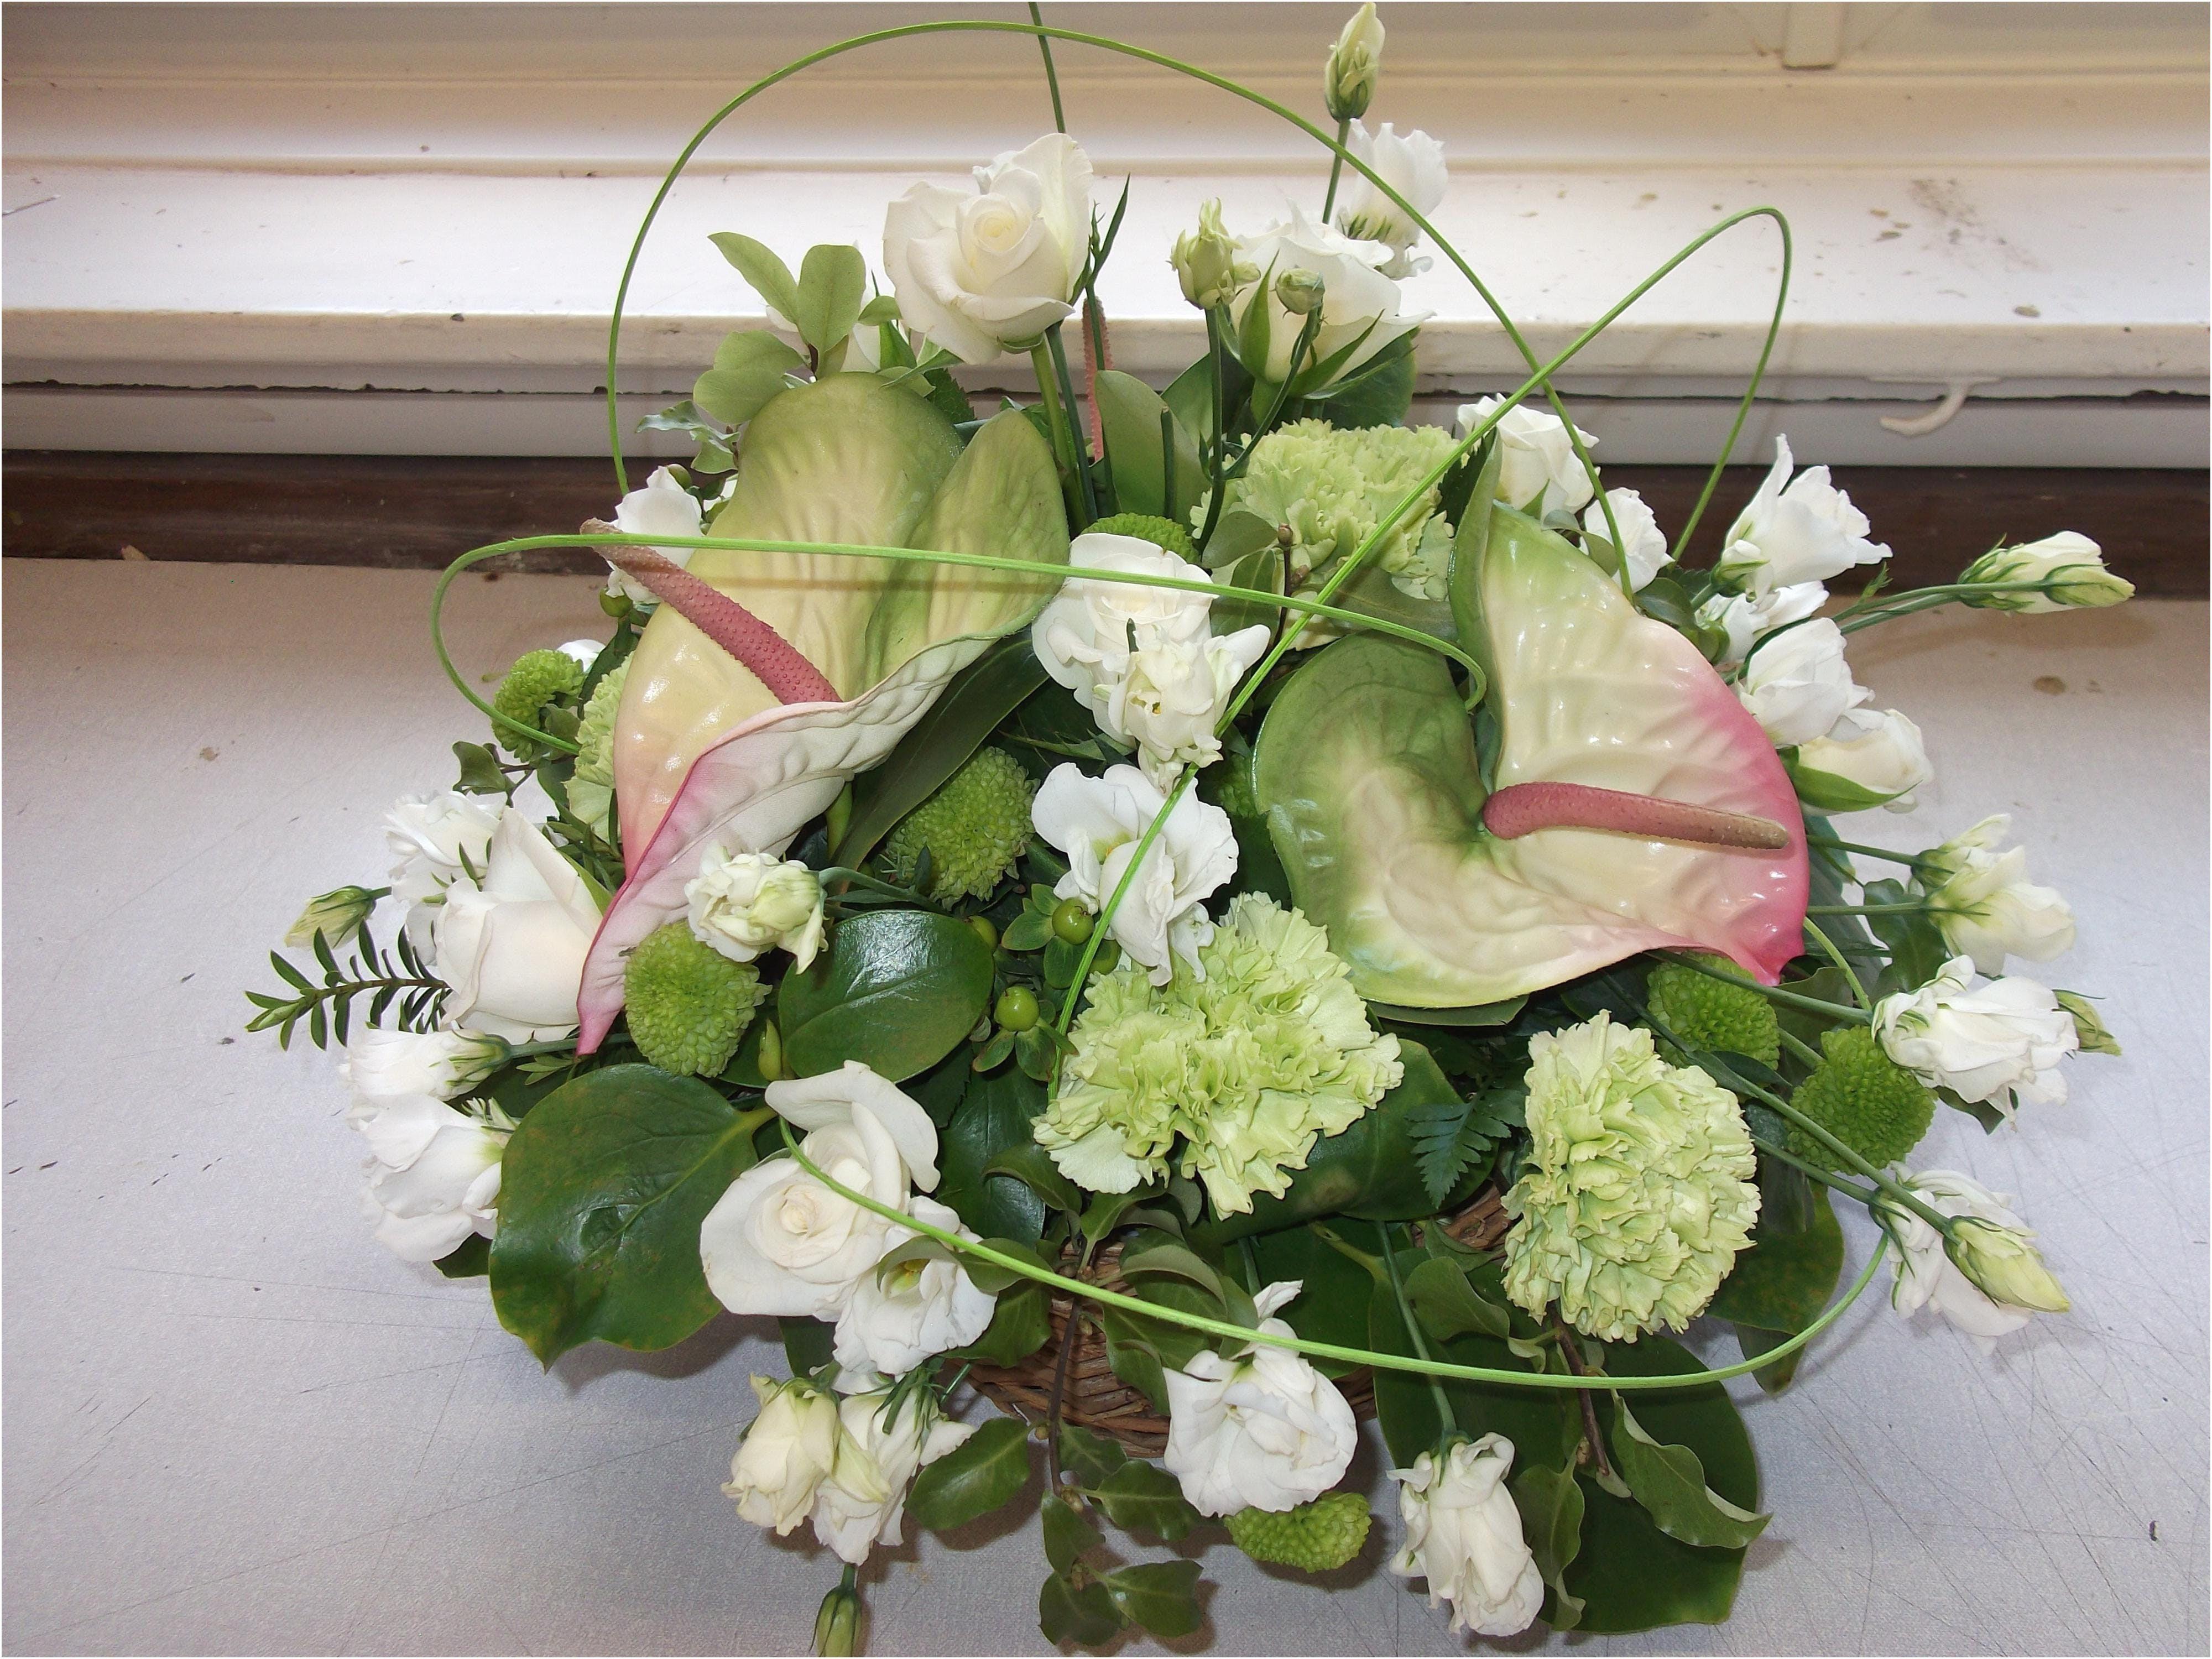 Wedding Gift Shop Shocking Flower Arranging Summer 17aclflsu 0d Ta Fresh His and Her Wedding Gifts